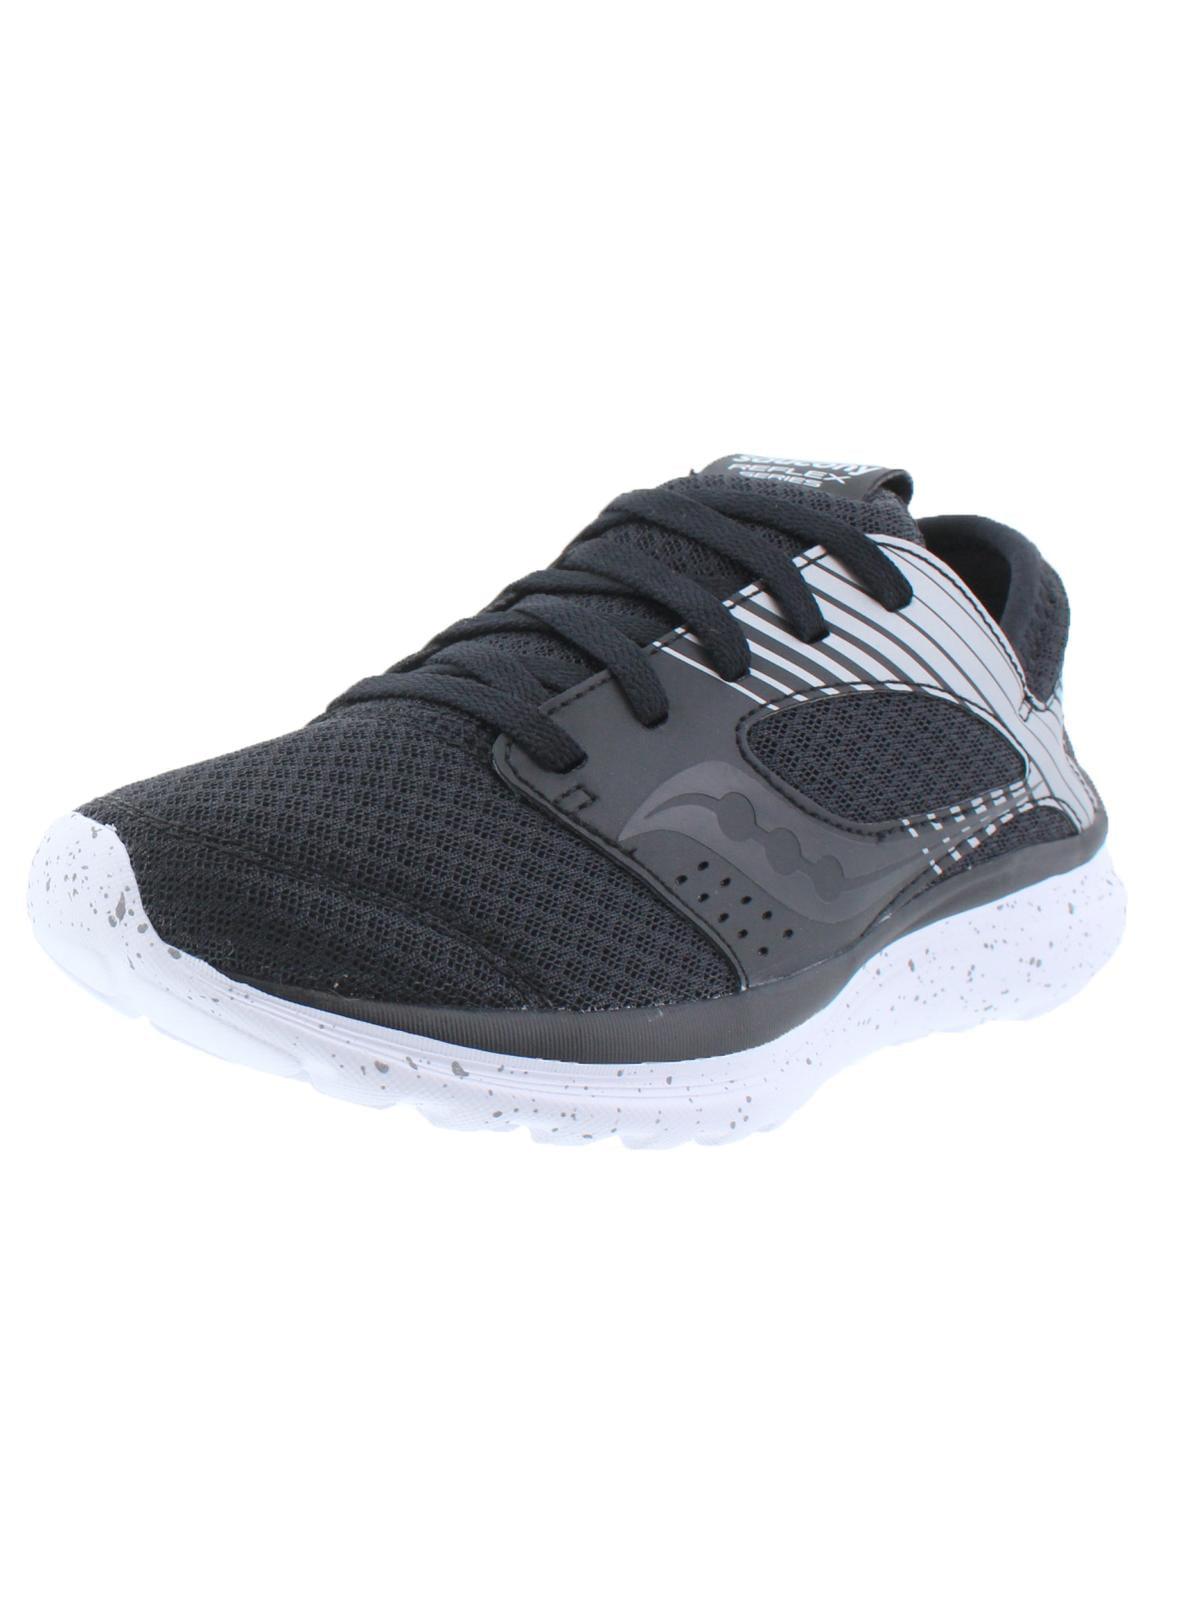 Saucony Womens Kineta Relay Reflex Memory Foam EVA Running Shoes by Saucony